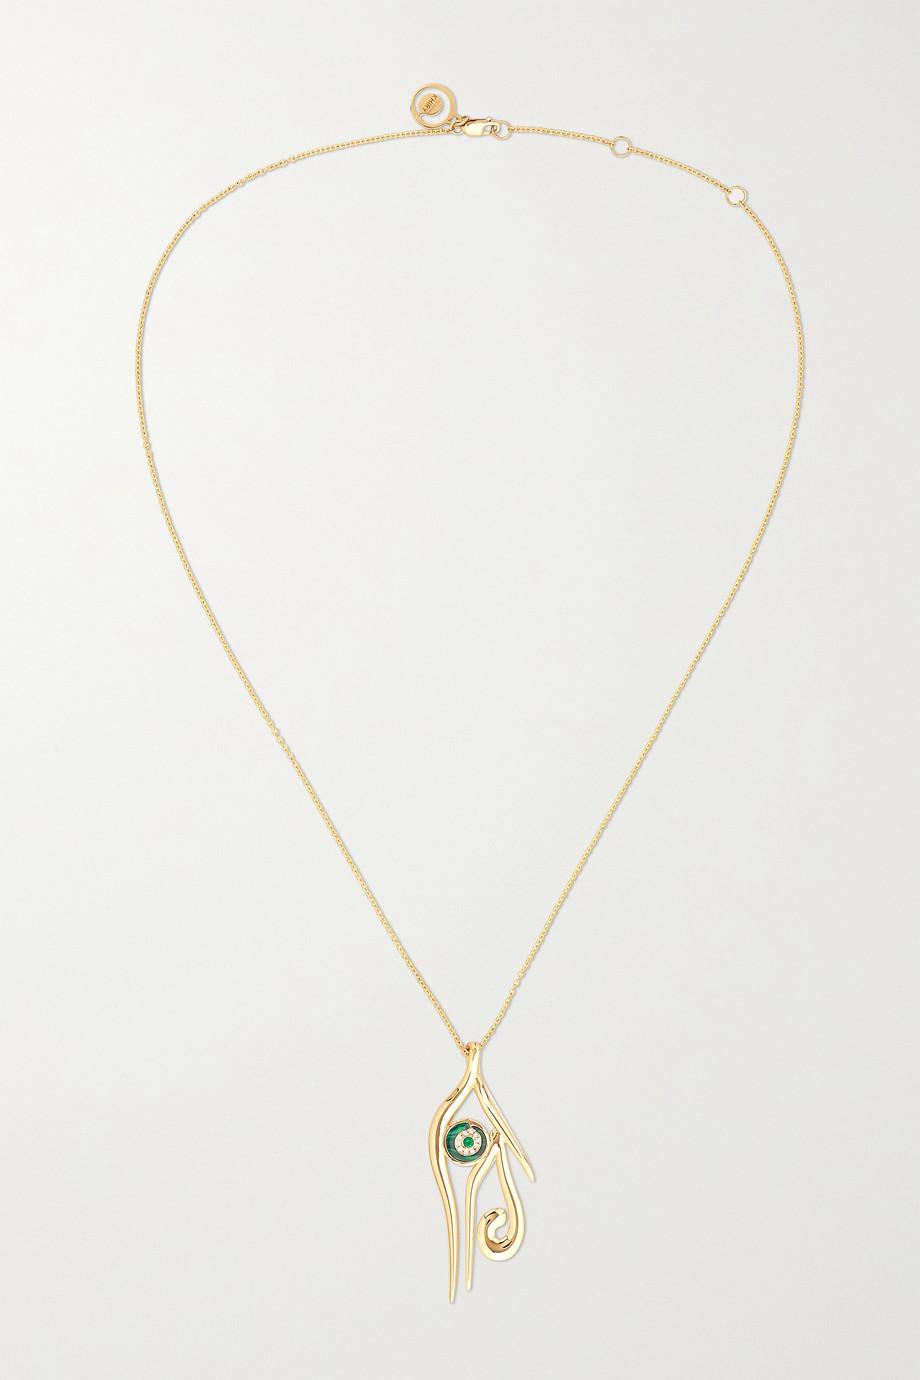 KHIRY Fine Horus 18-karat gold multi-stone necklace